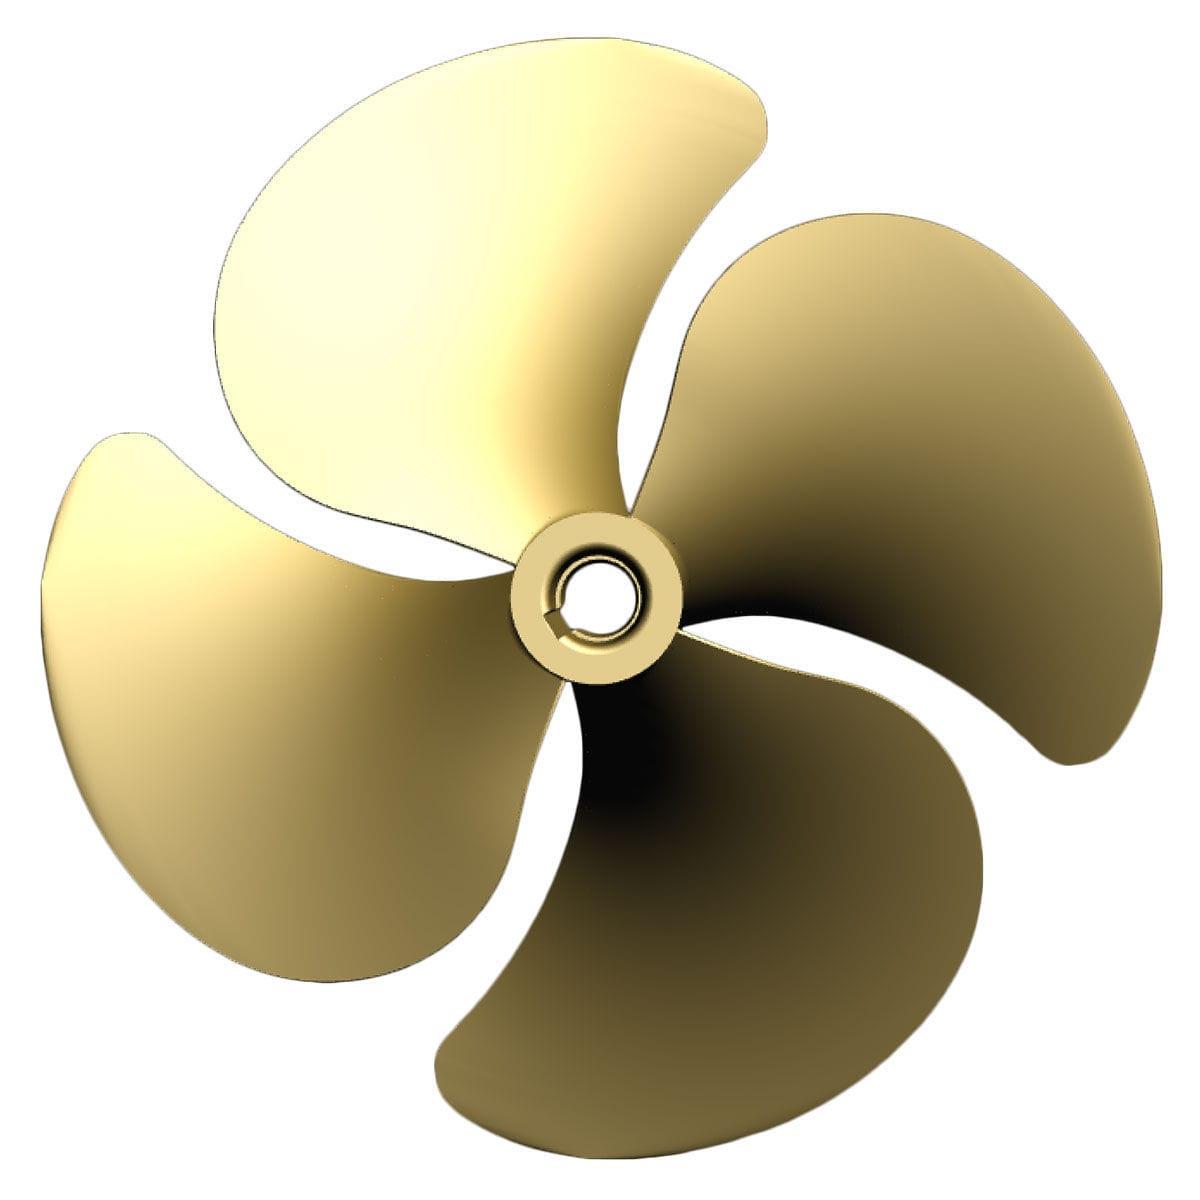 Ship propeller / for yachts / skew / shaft drive.